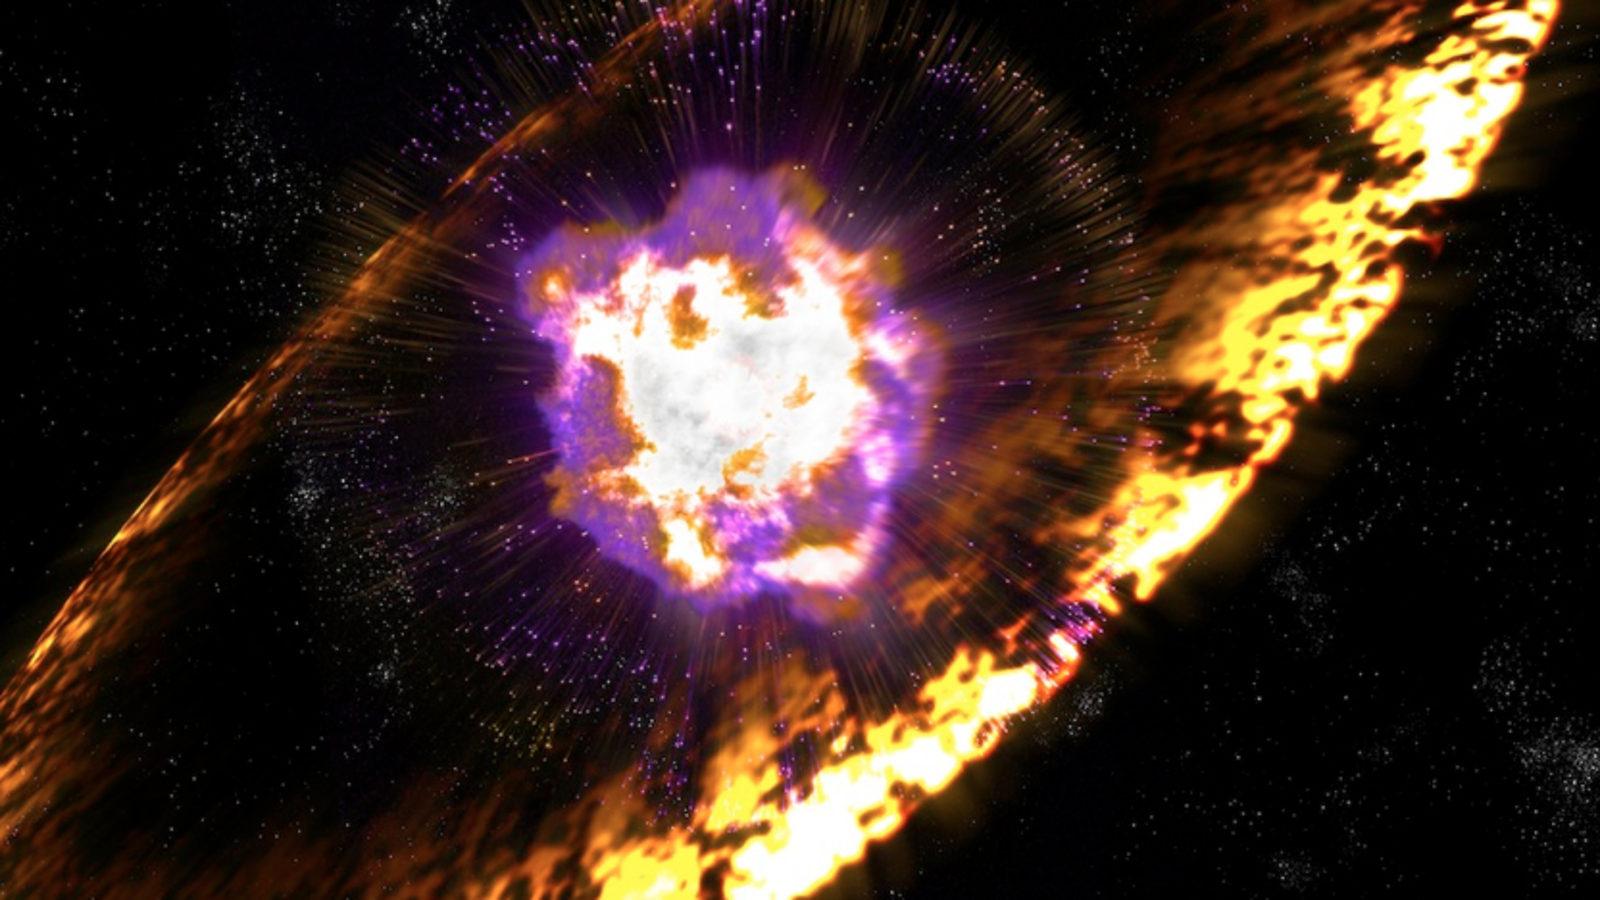 Image: Supernova shockwave